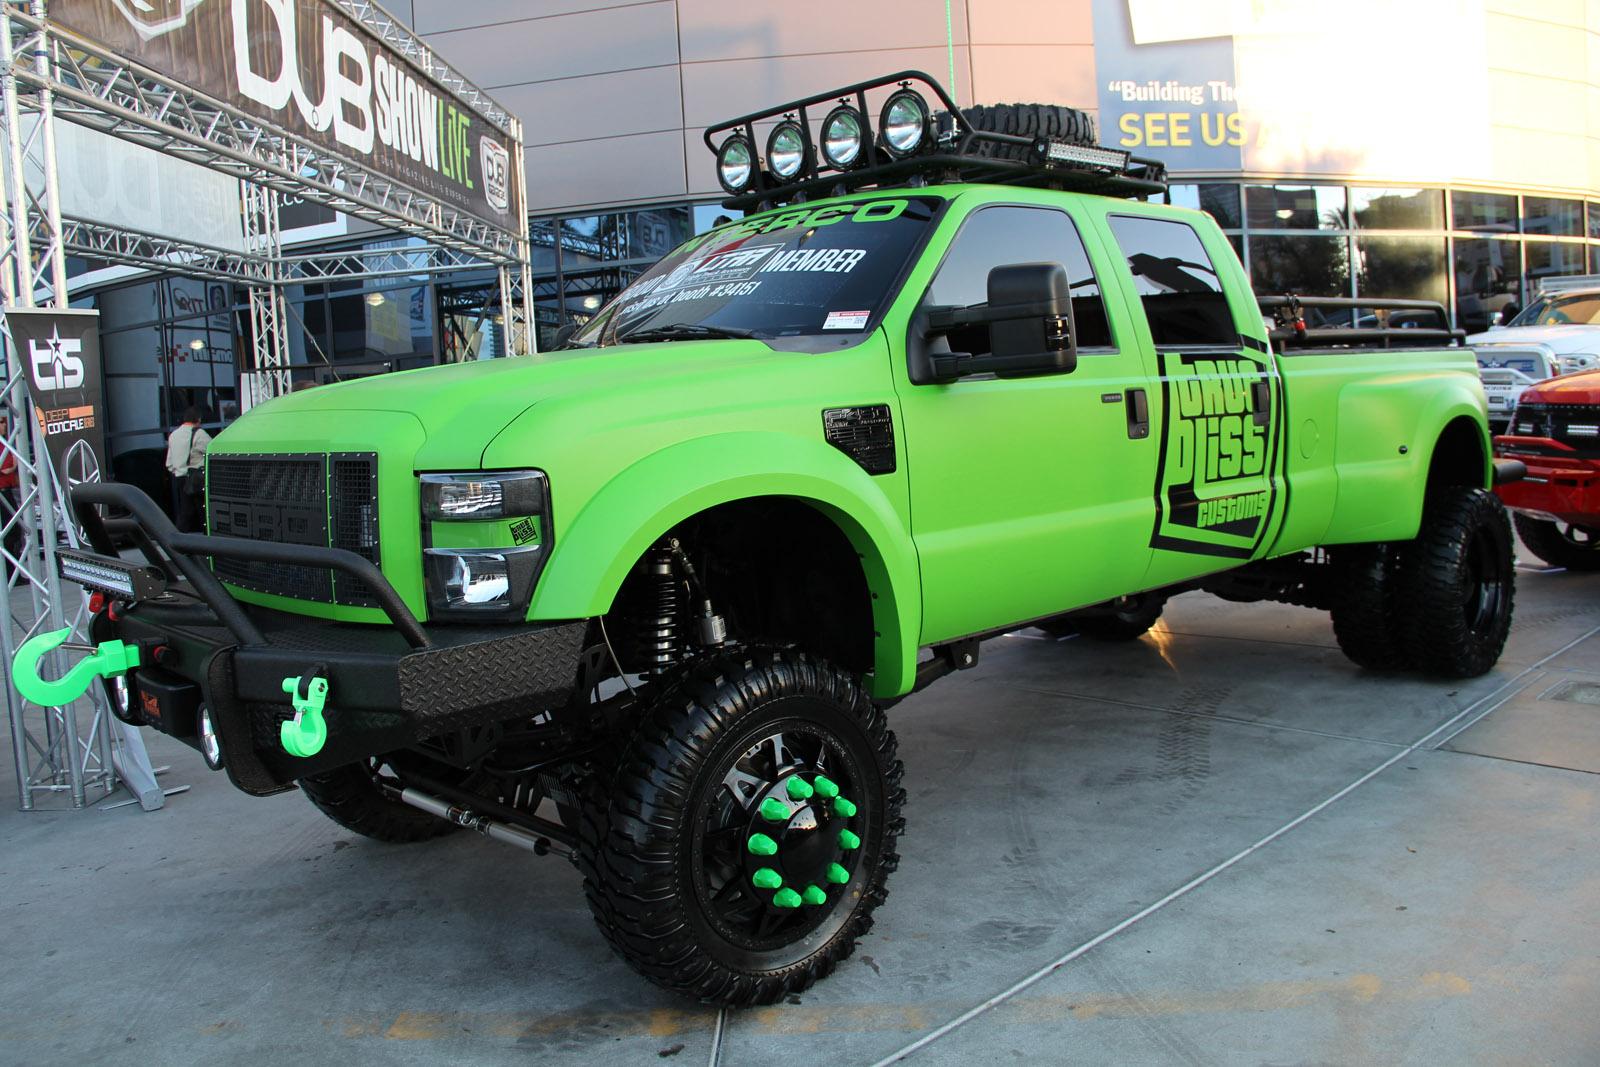 Ford Raptor 4x4 Lifted >> Diesel Power Wallpaper - WallpaperSafari